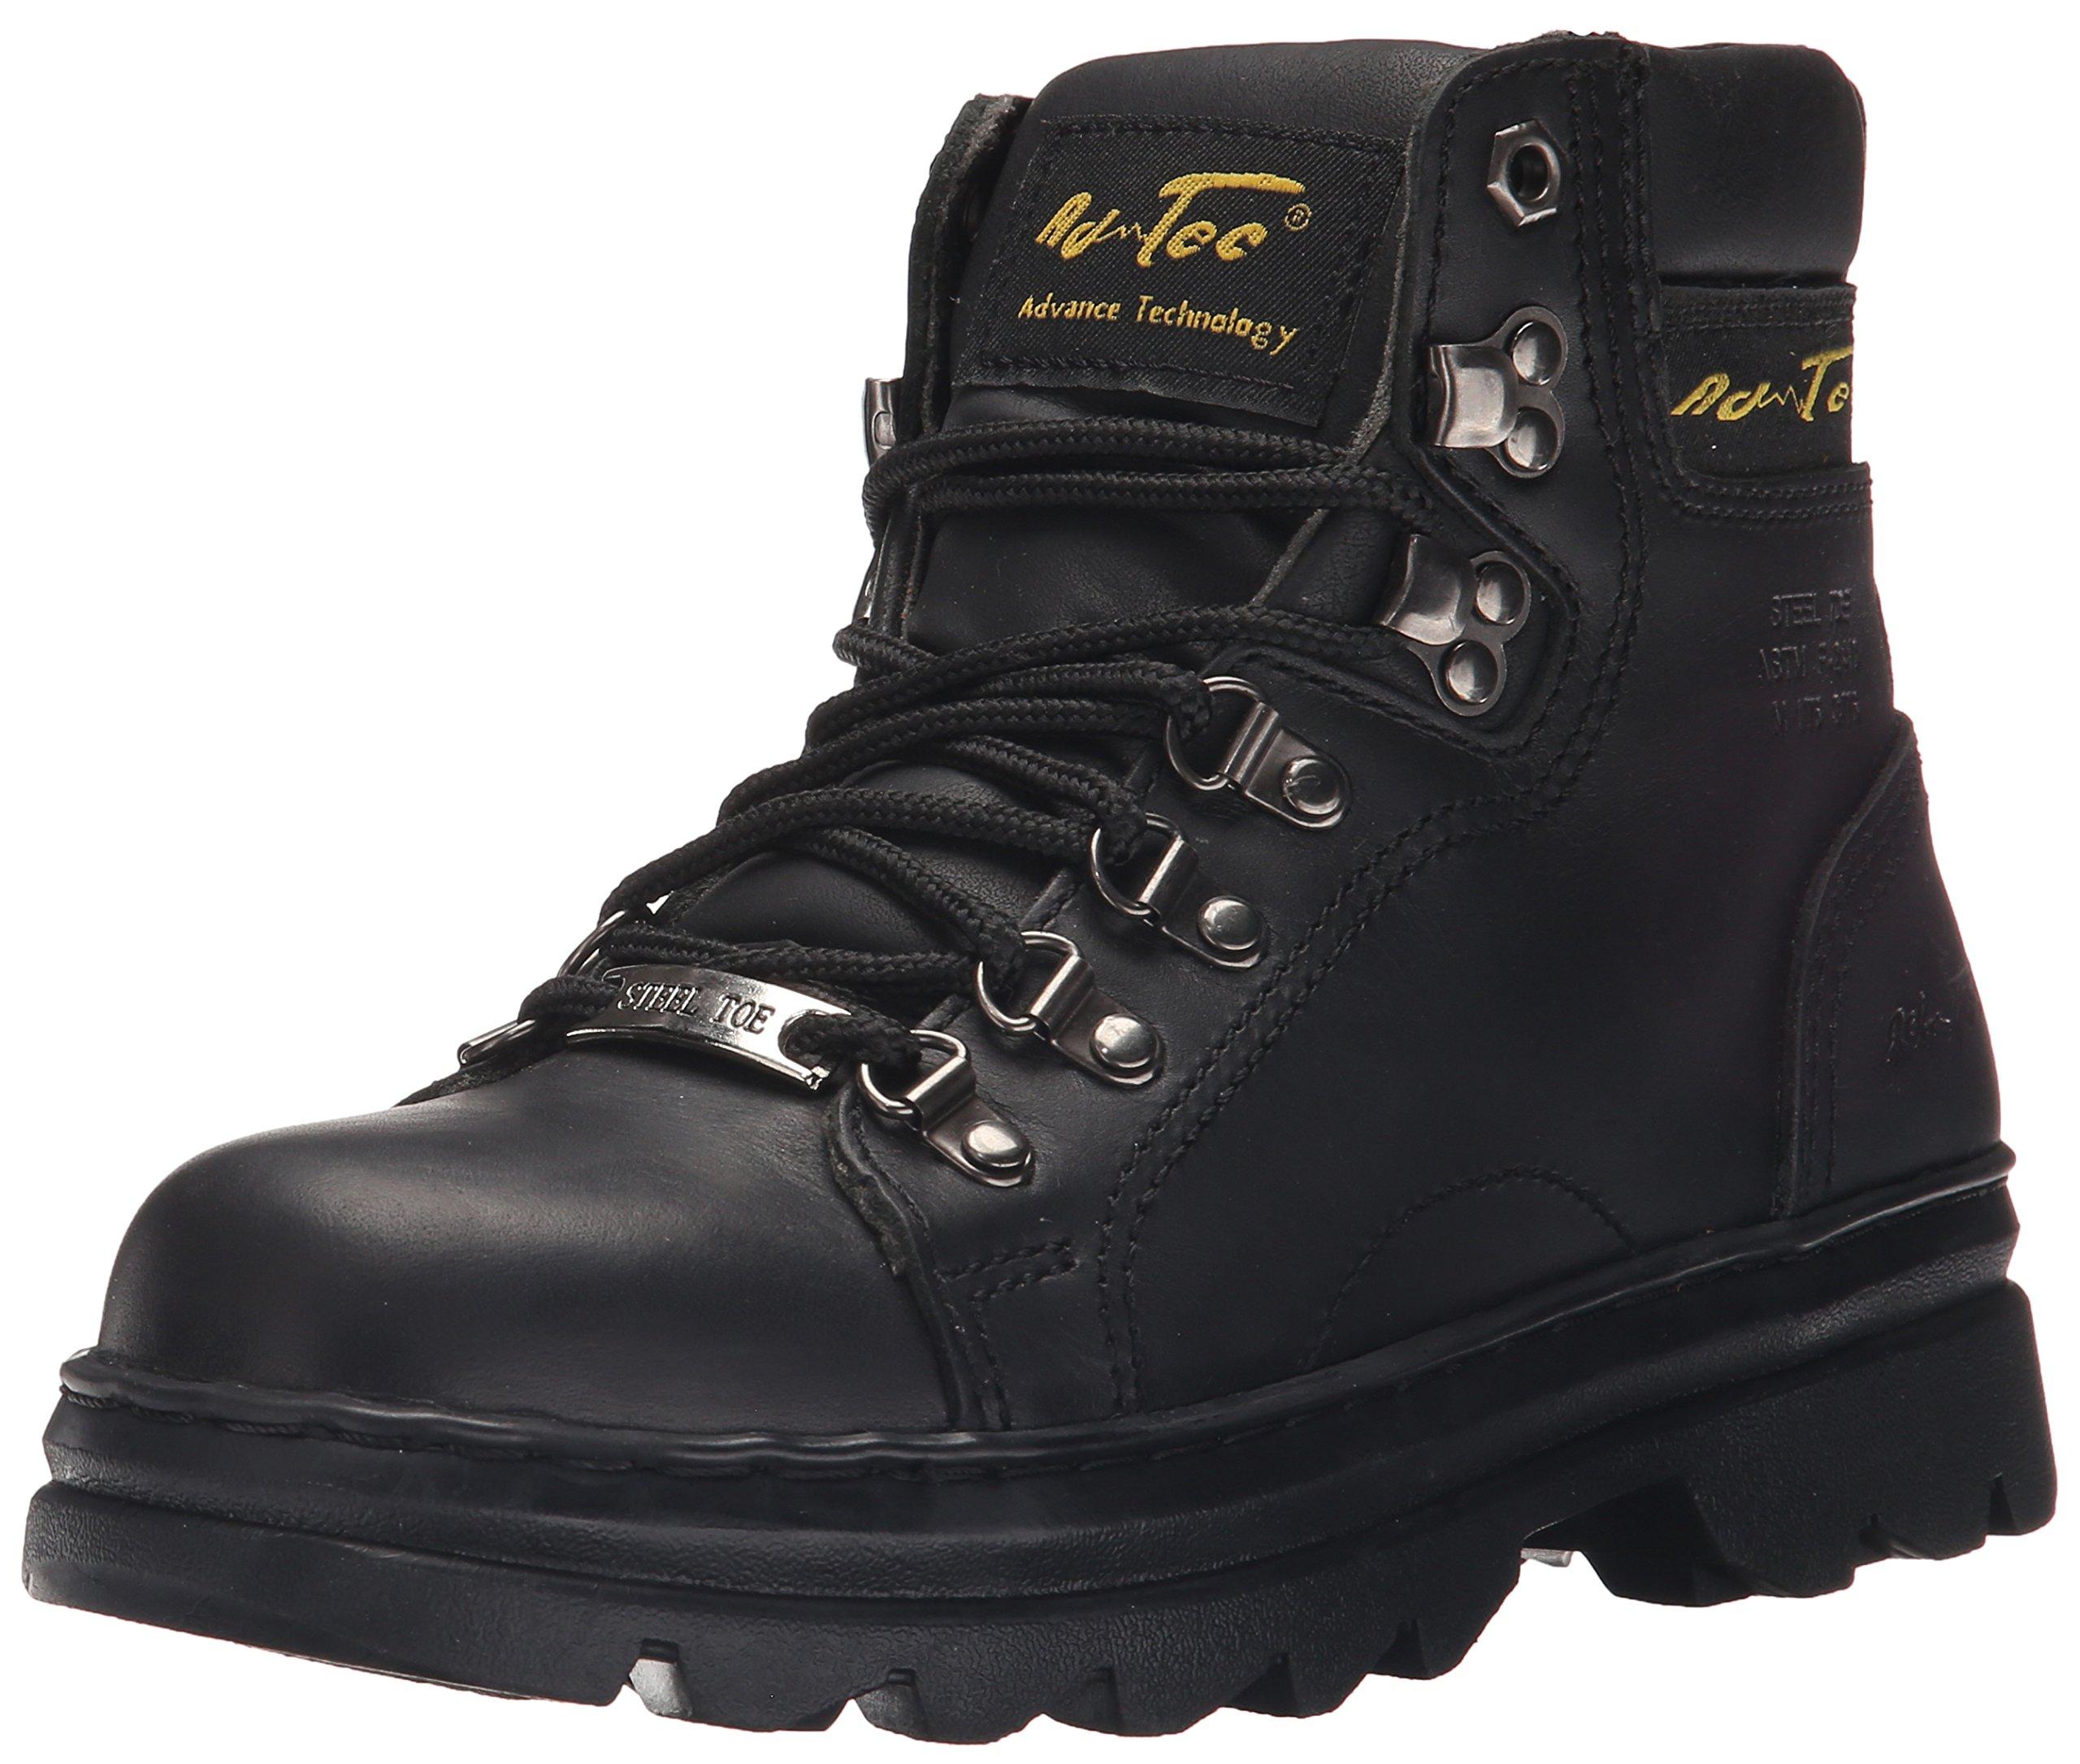 Adtec Women's 6'' Steel Toe Work Work Boot, Black, 8.5 M US